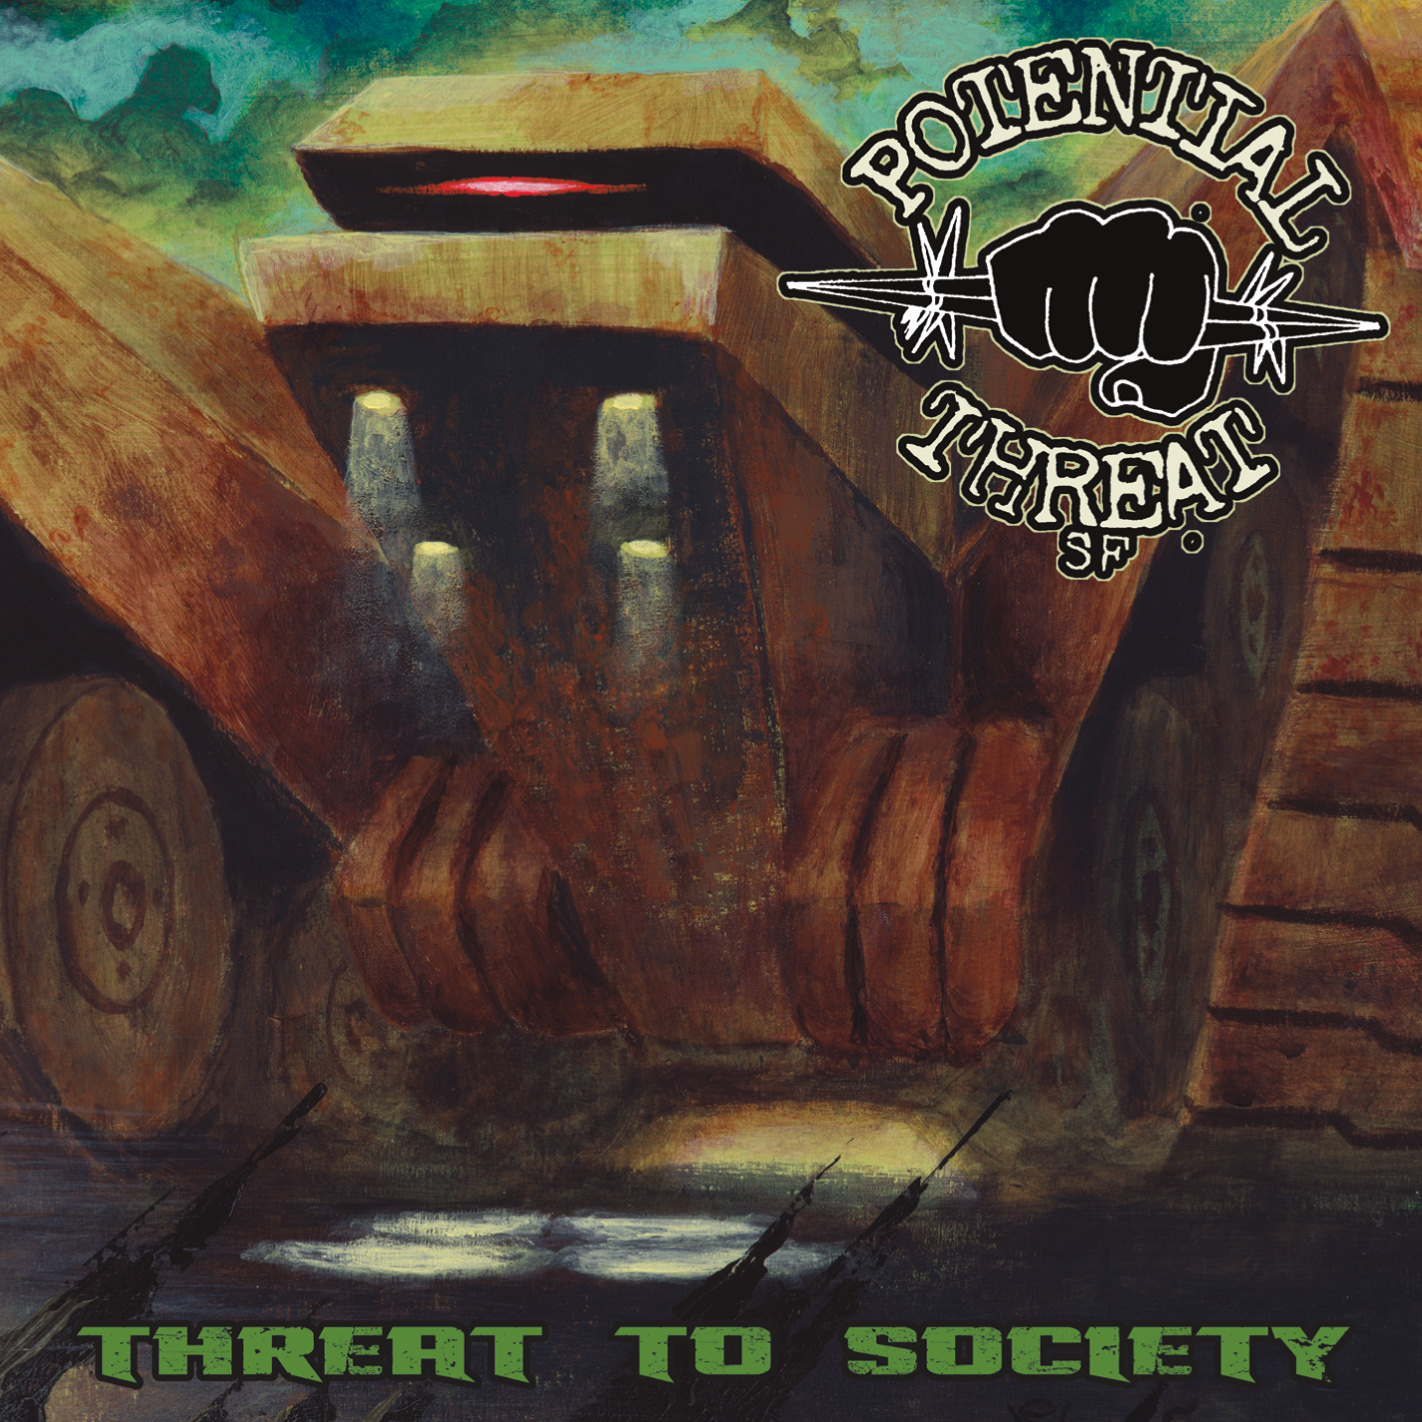 potential-threat-sf-threat-to-society-ein-album-review